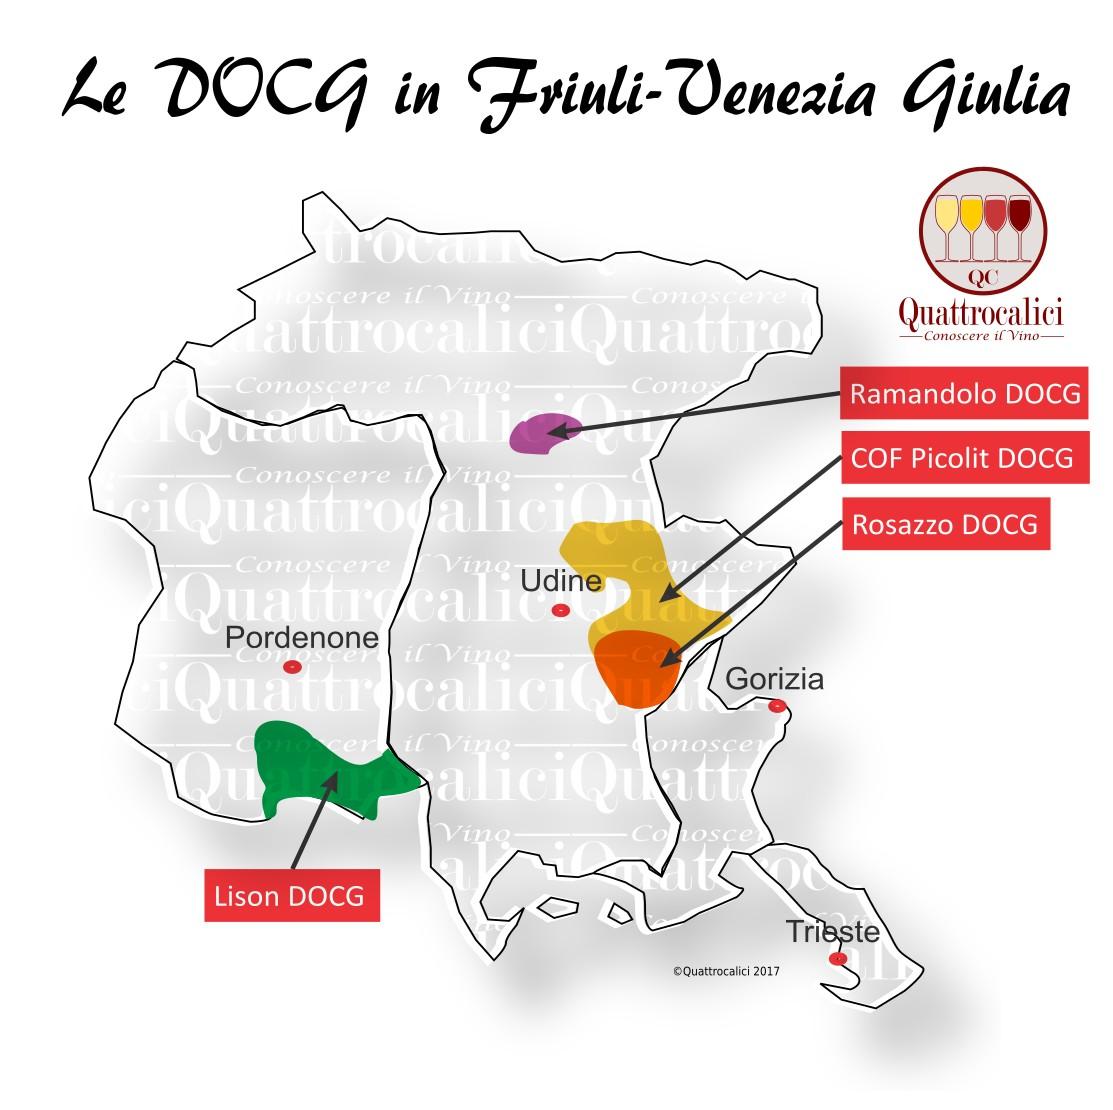 Le DOCG in Friuli-Venezia Giulia